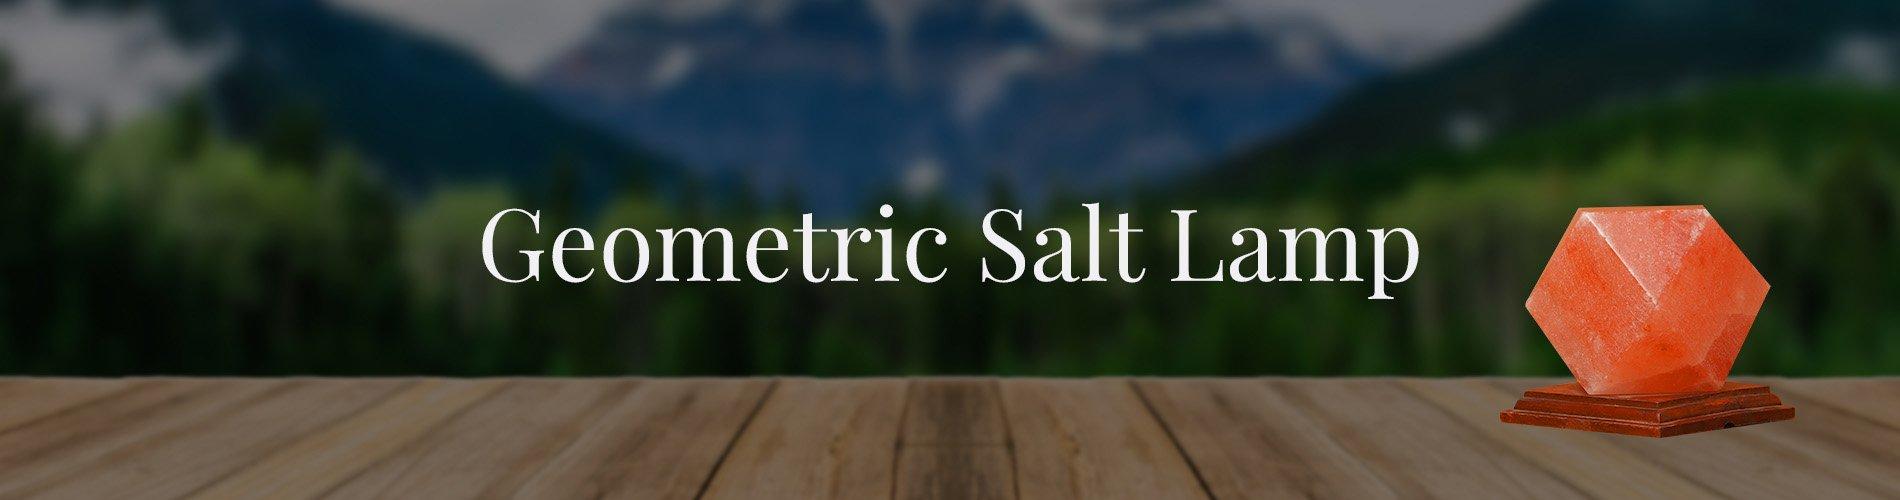 Geometric shaped salt lamp